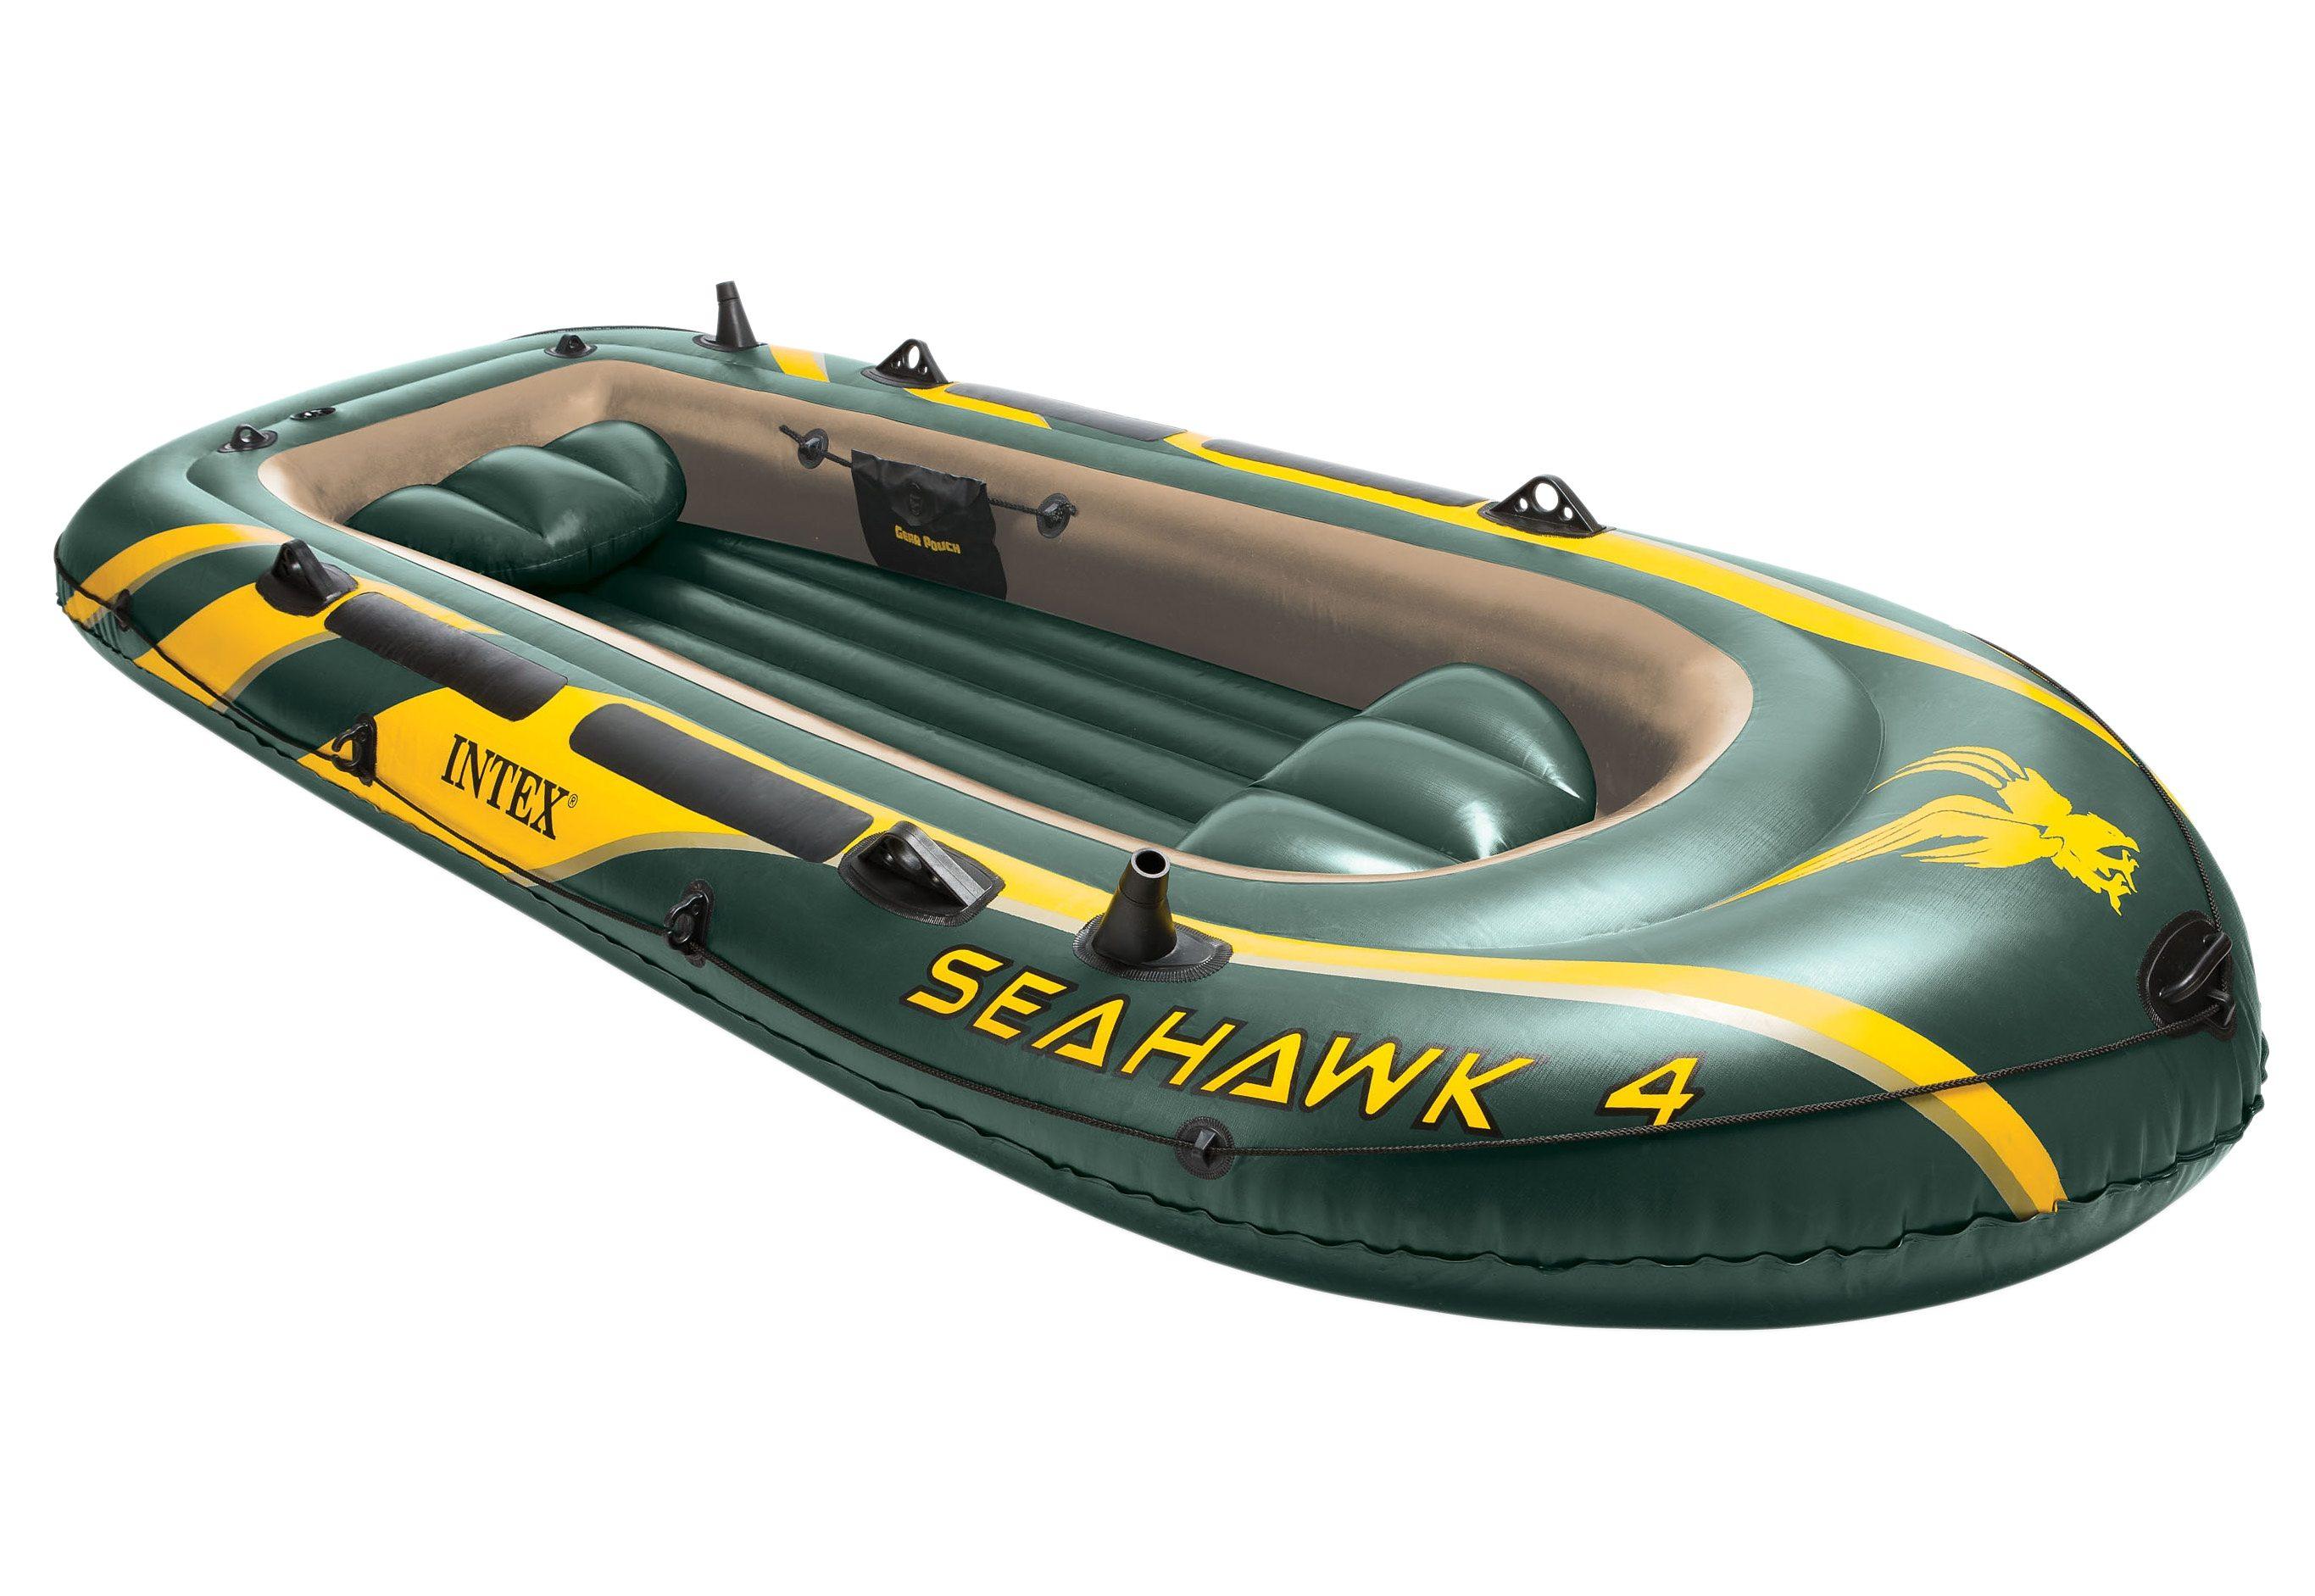 Sportboot-Set, mit 2 Paddeln und Luftpumpe, »Boot-Set Seahawk 4«, Intex